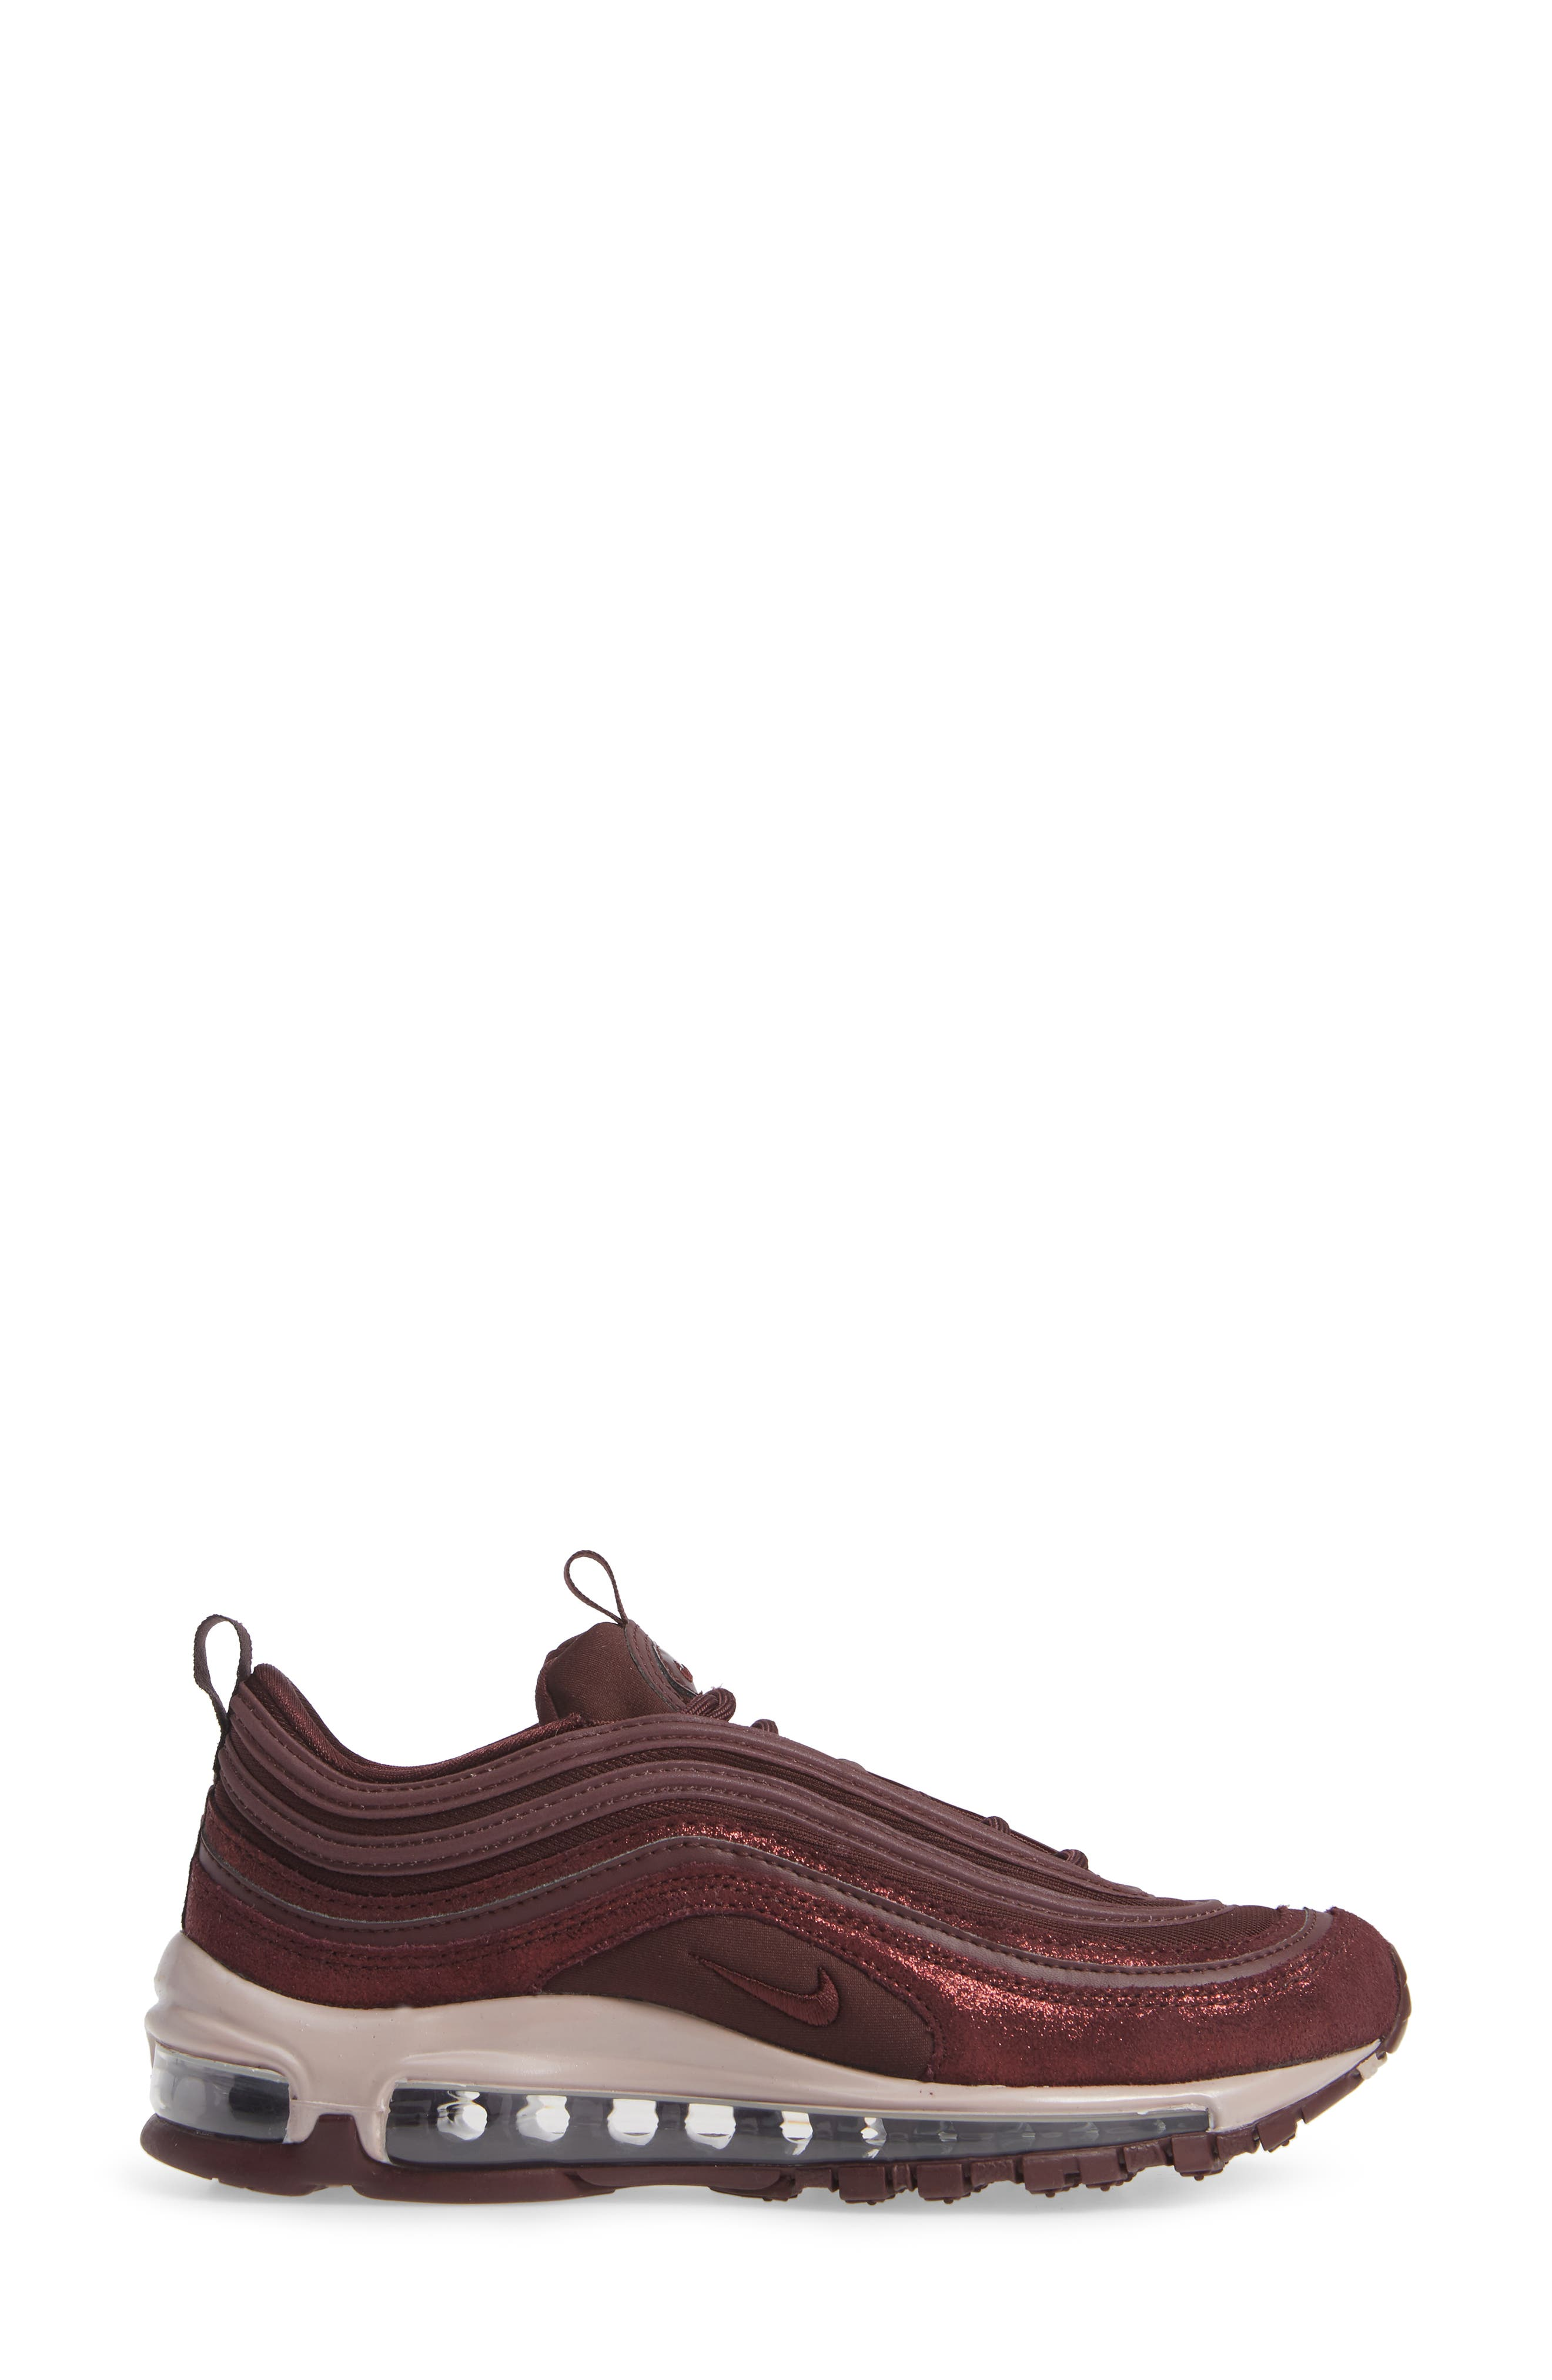 Air Max 97 SE Sneaker,                             Alternate thumbnail 3, color,                             BURGUNDY/ METALLIC MAHOGANY